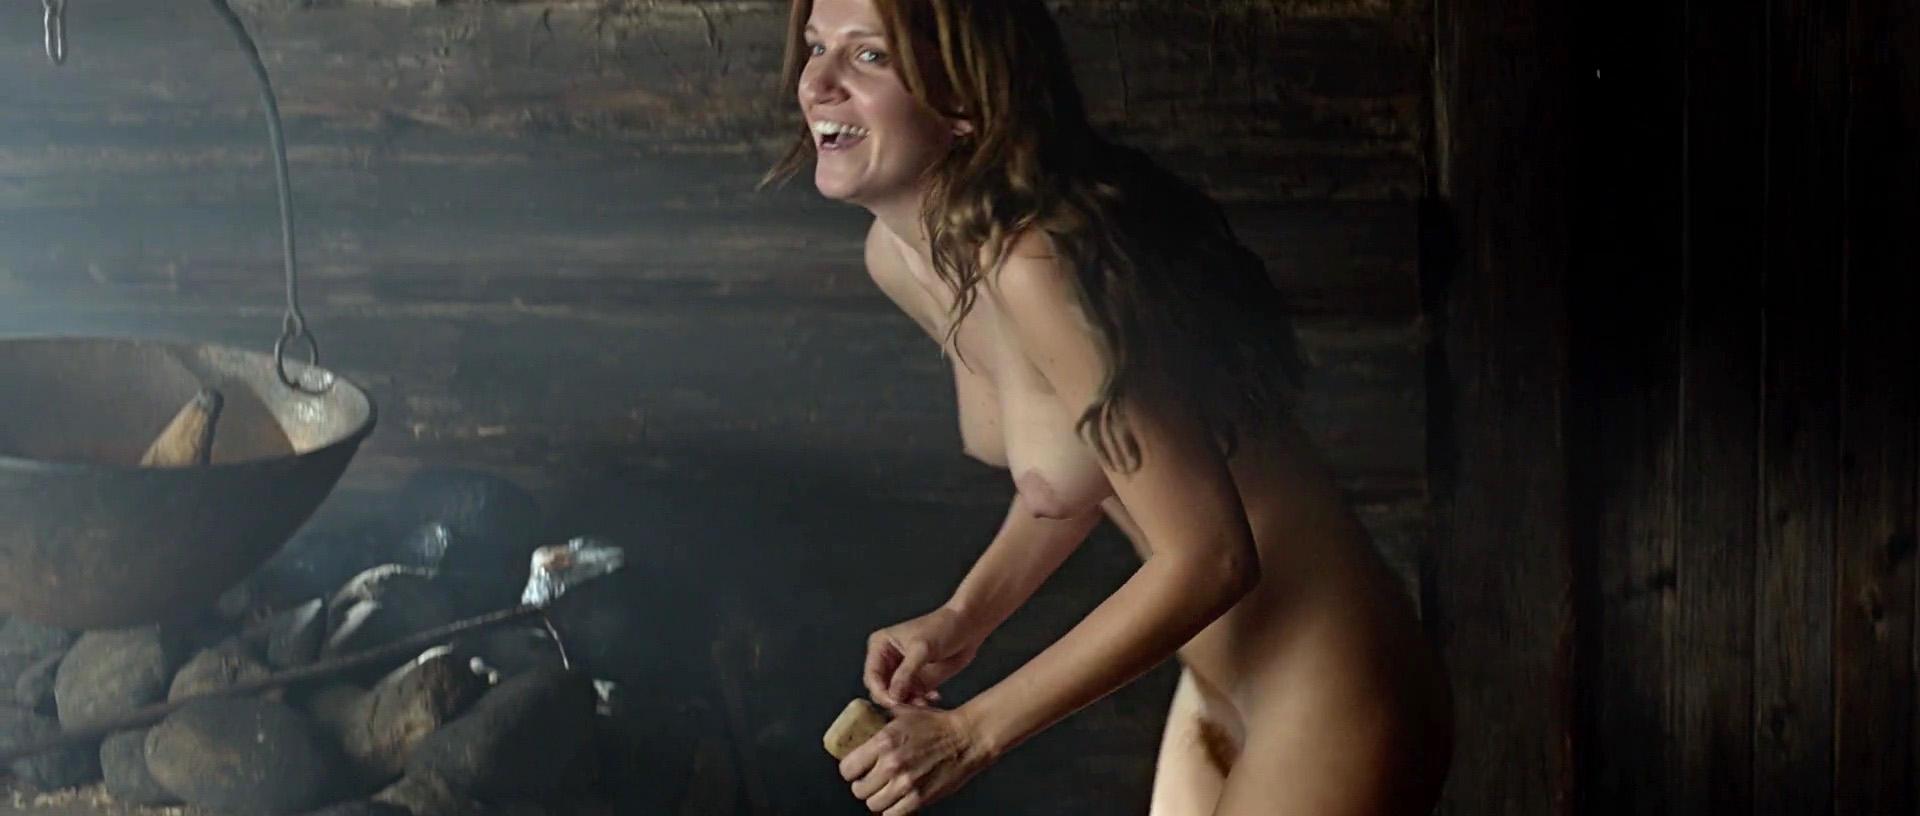 Fuck Anastasiya Mikulchina naked (44 photos), Tits, Cleavage, Selfie, in bikini 2017